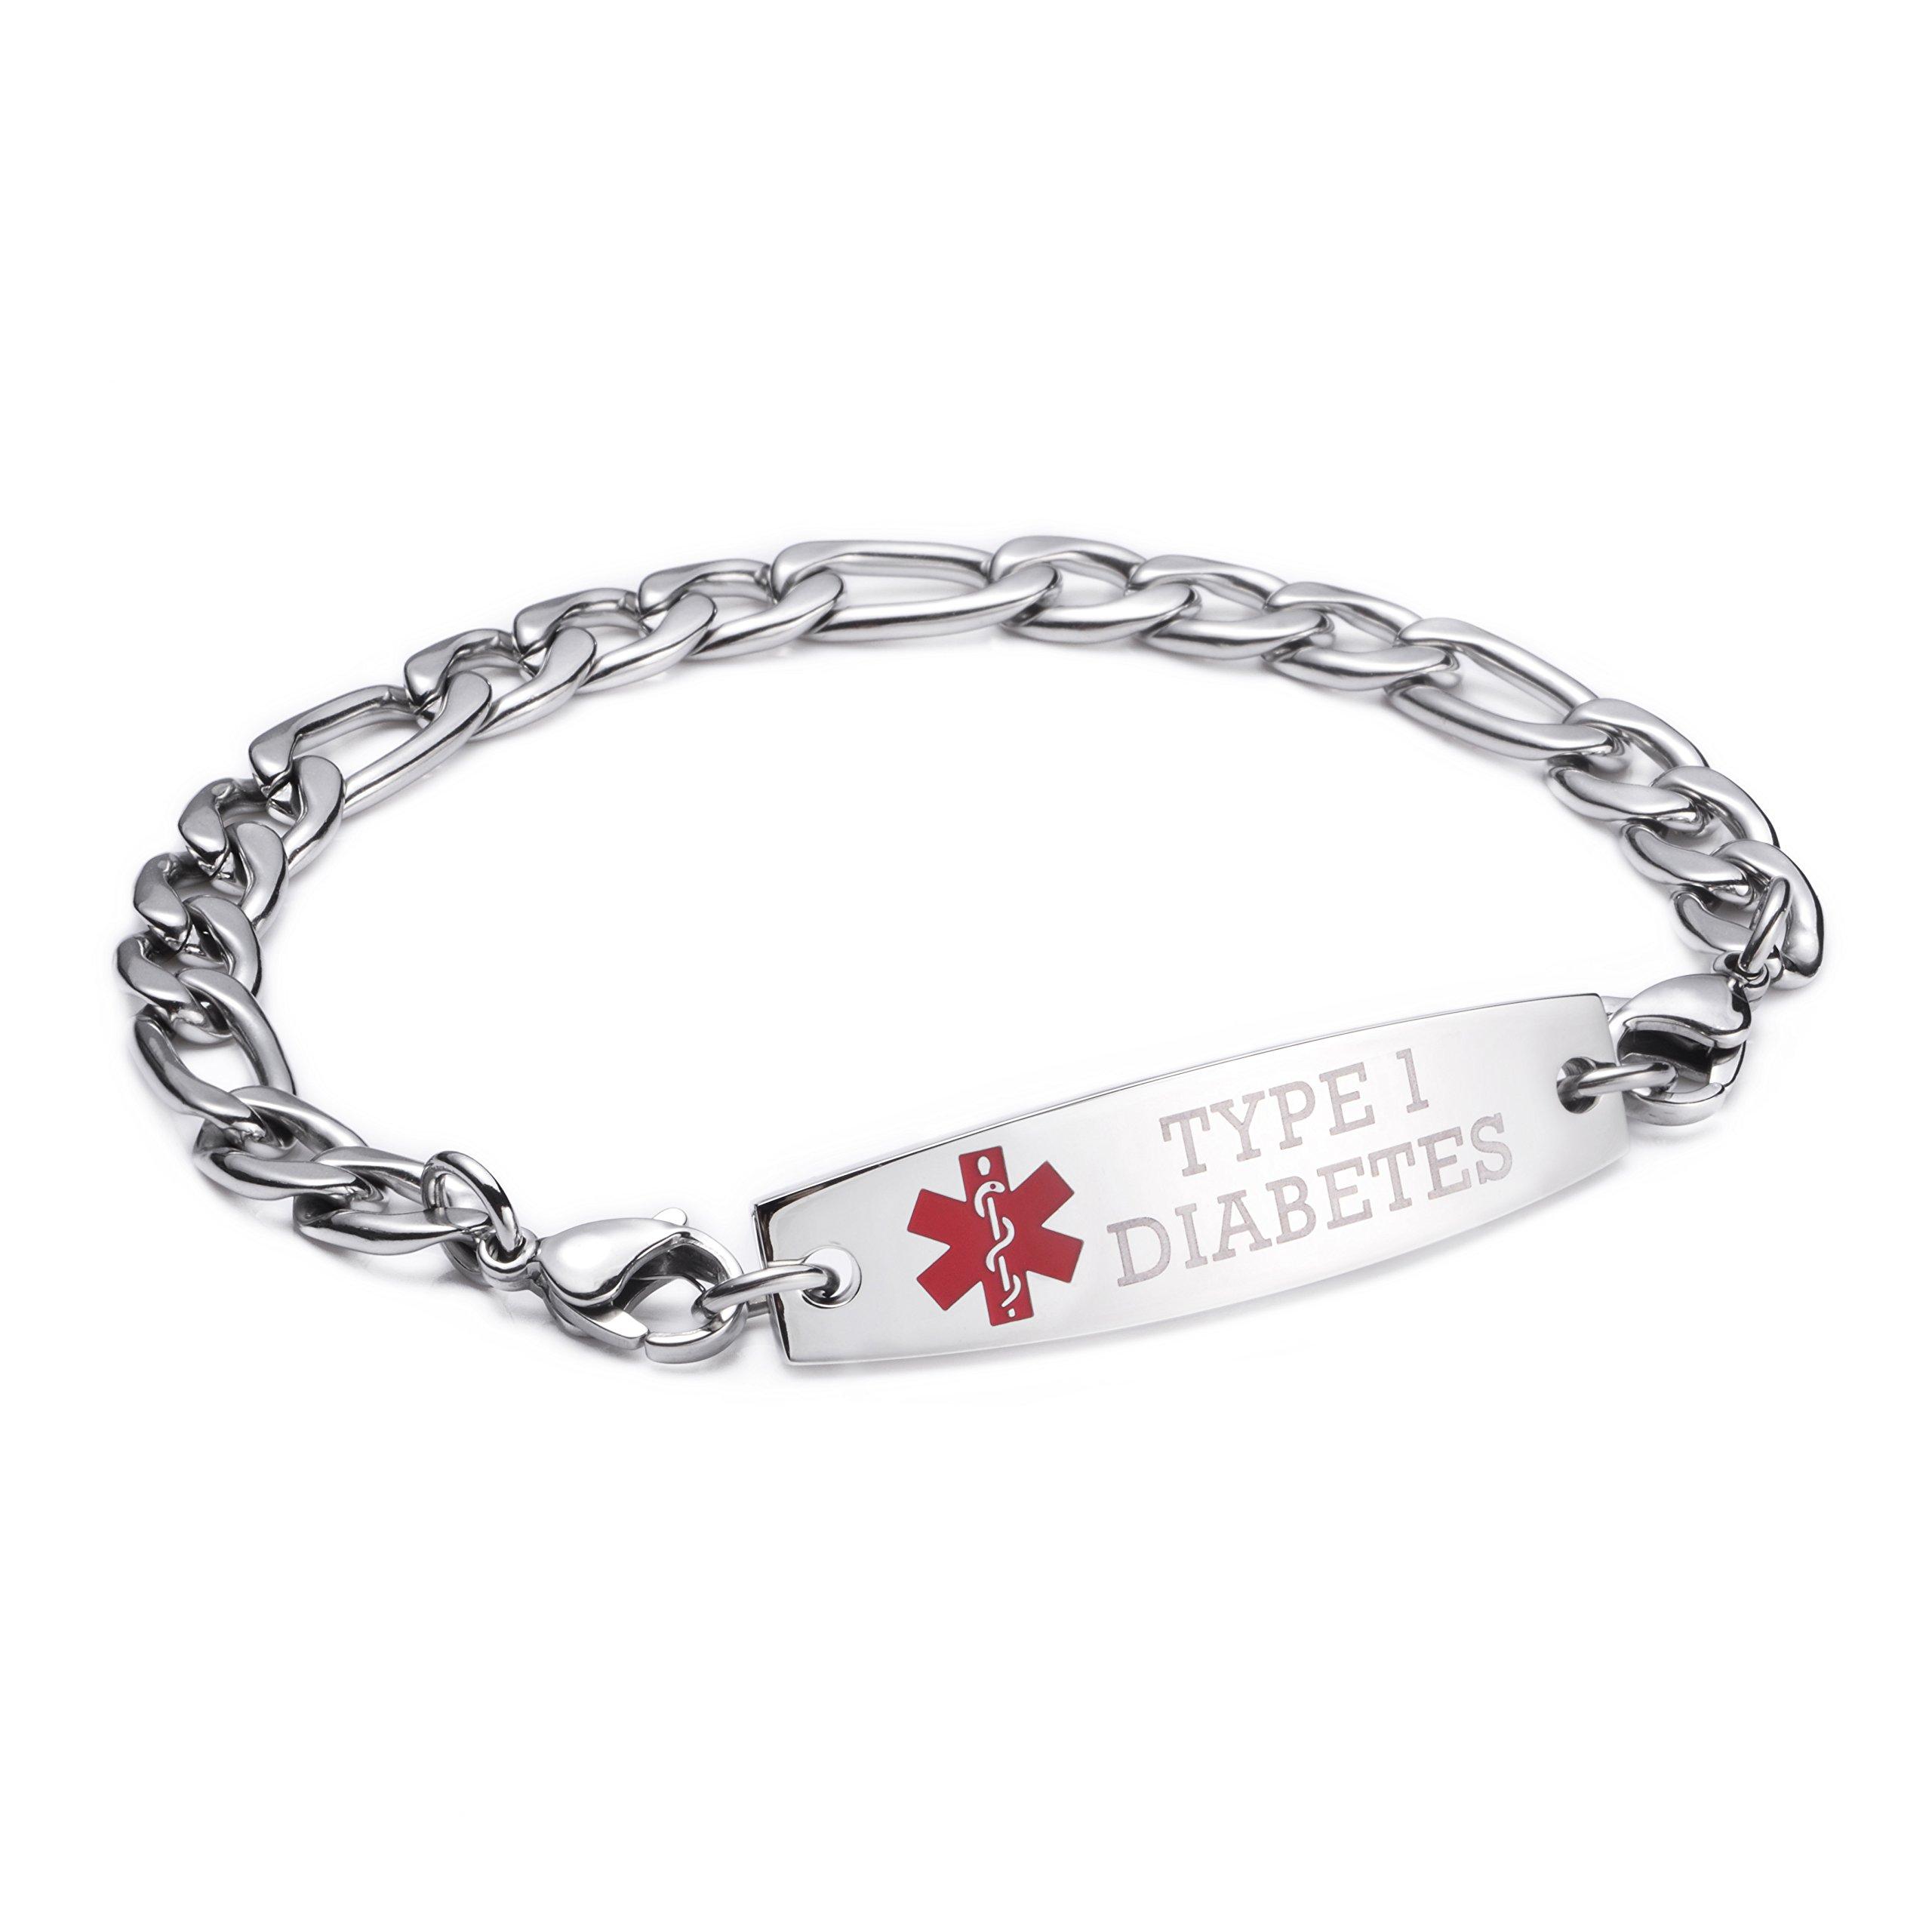 linnalove-Stainless Steel Figaro Chain lnterchangeable Medical Alert Bracelets-Pre-Engraving(Type 1 Diabetes/7.5'')